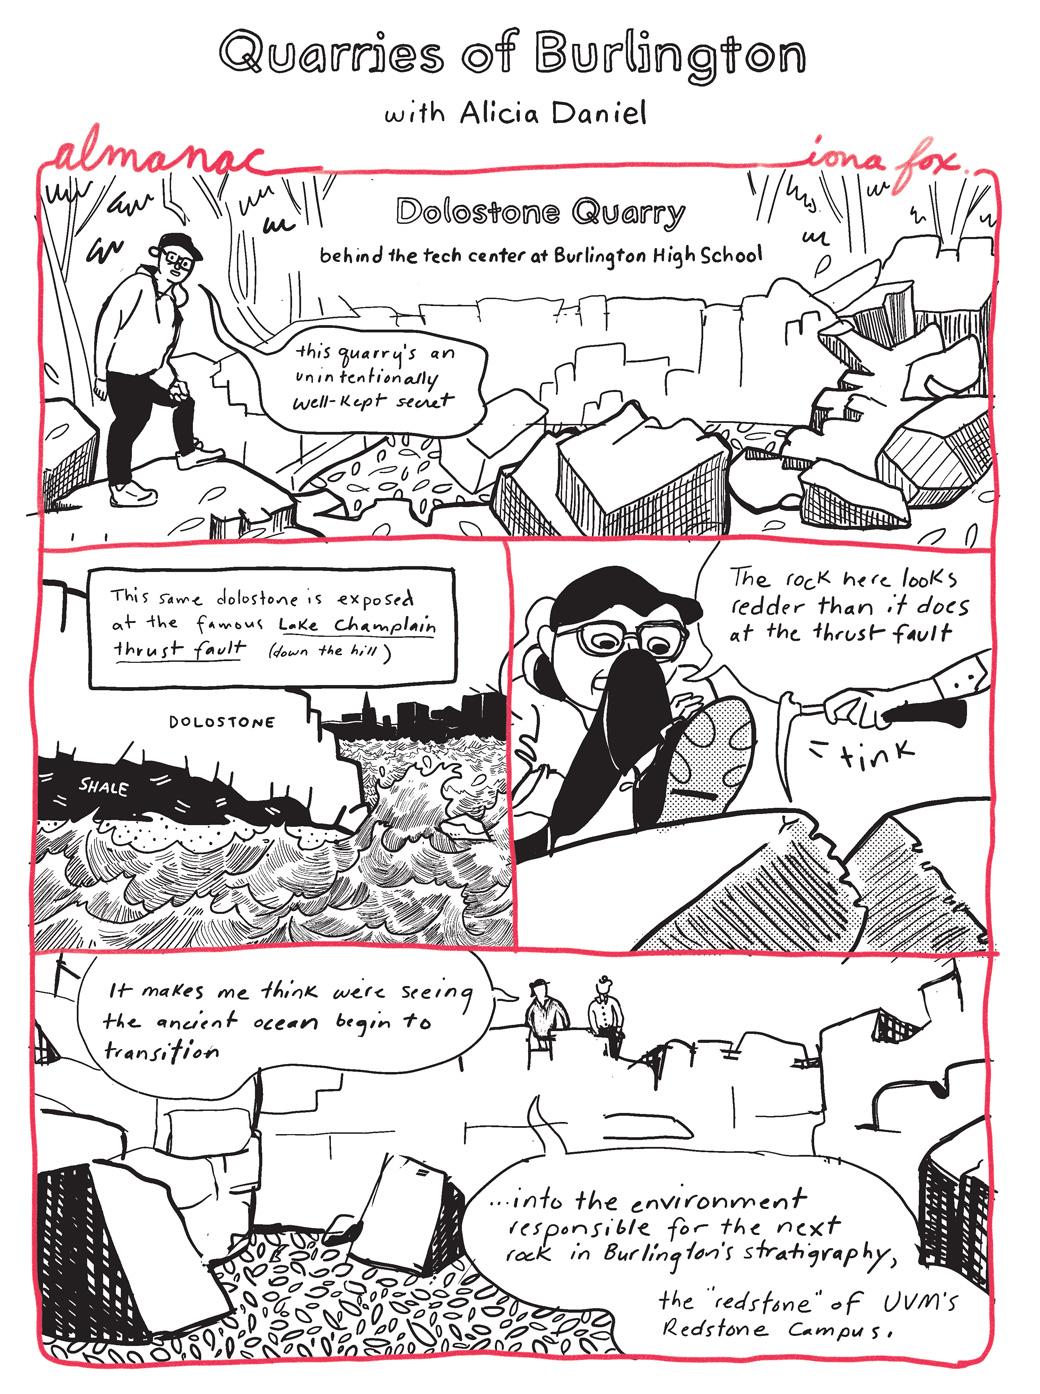 Iona-Fox-Dolostone-Quarry.jpg